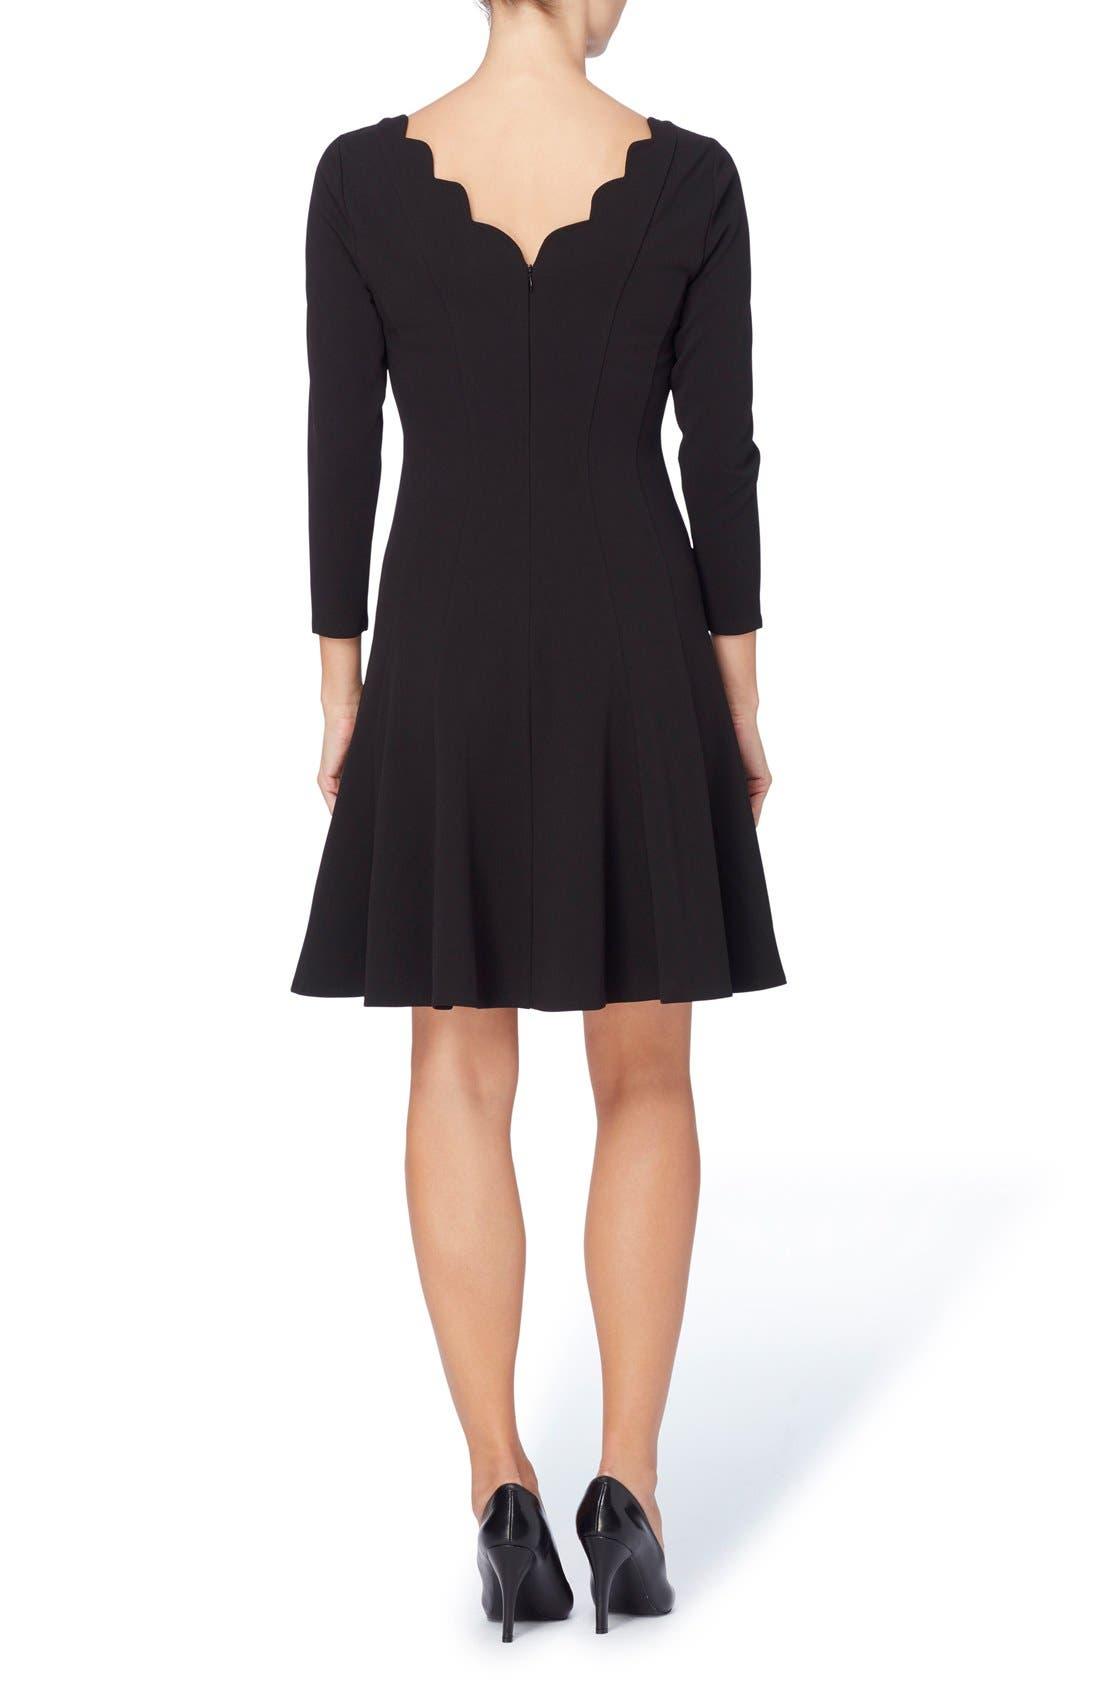 CATHERINE CATHERINE MALANDRINO,                             Linova Fit & Flare Dress,                             Alternate thumbnail 2, color,                             003